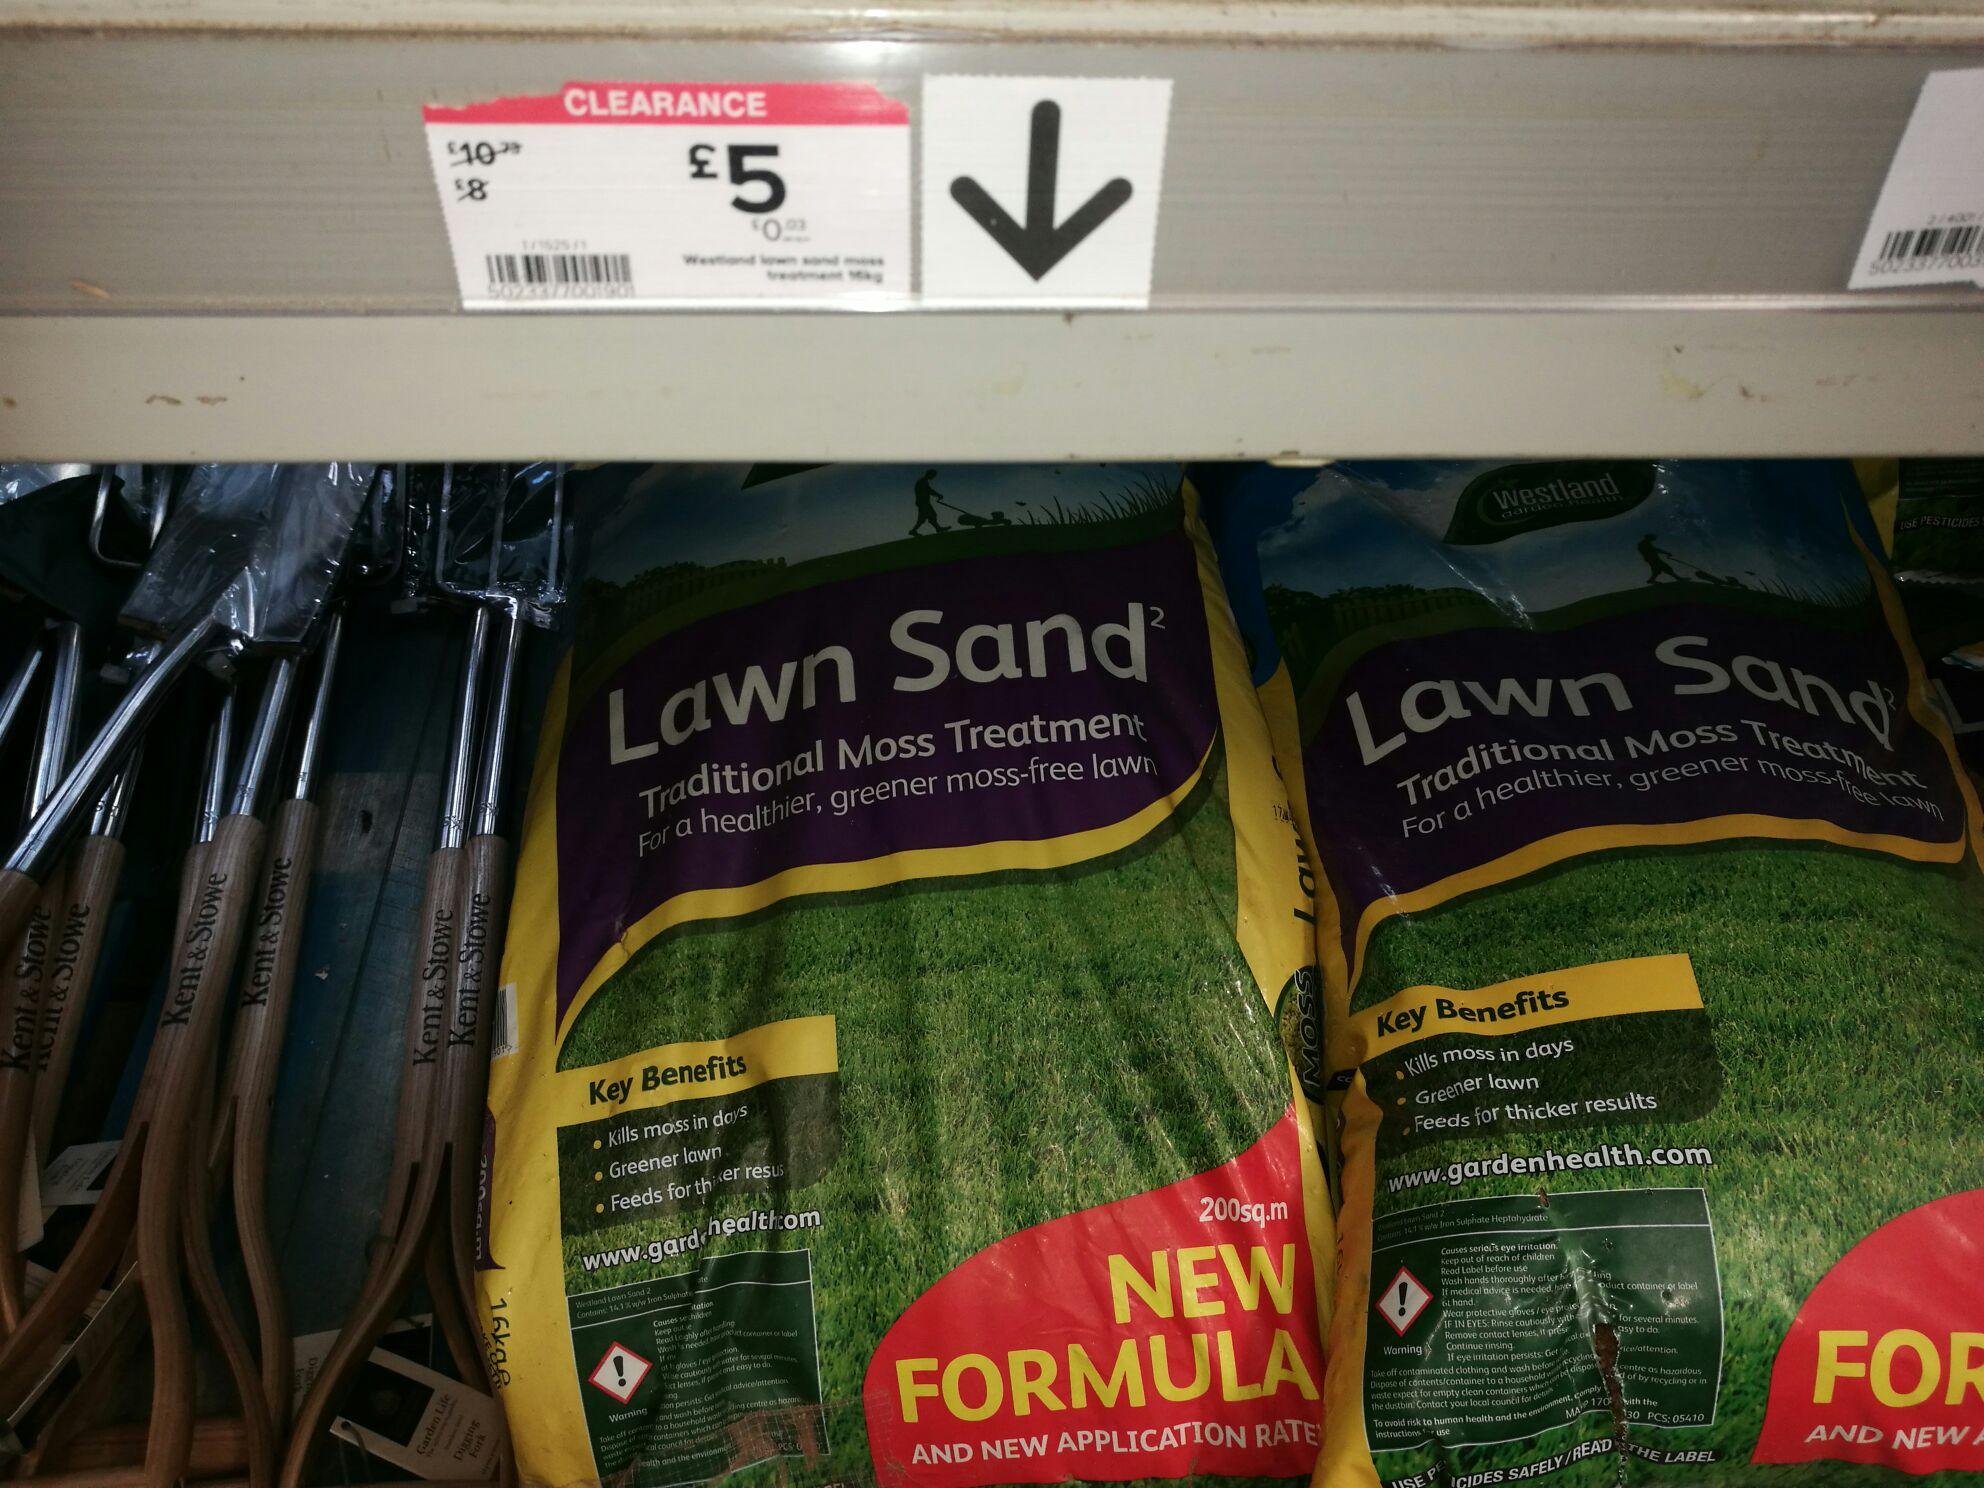 Westland lawn sand less than half price at GBP 5 @ B&Q